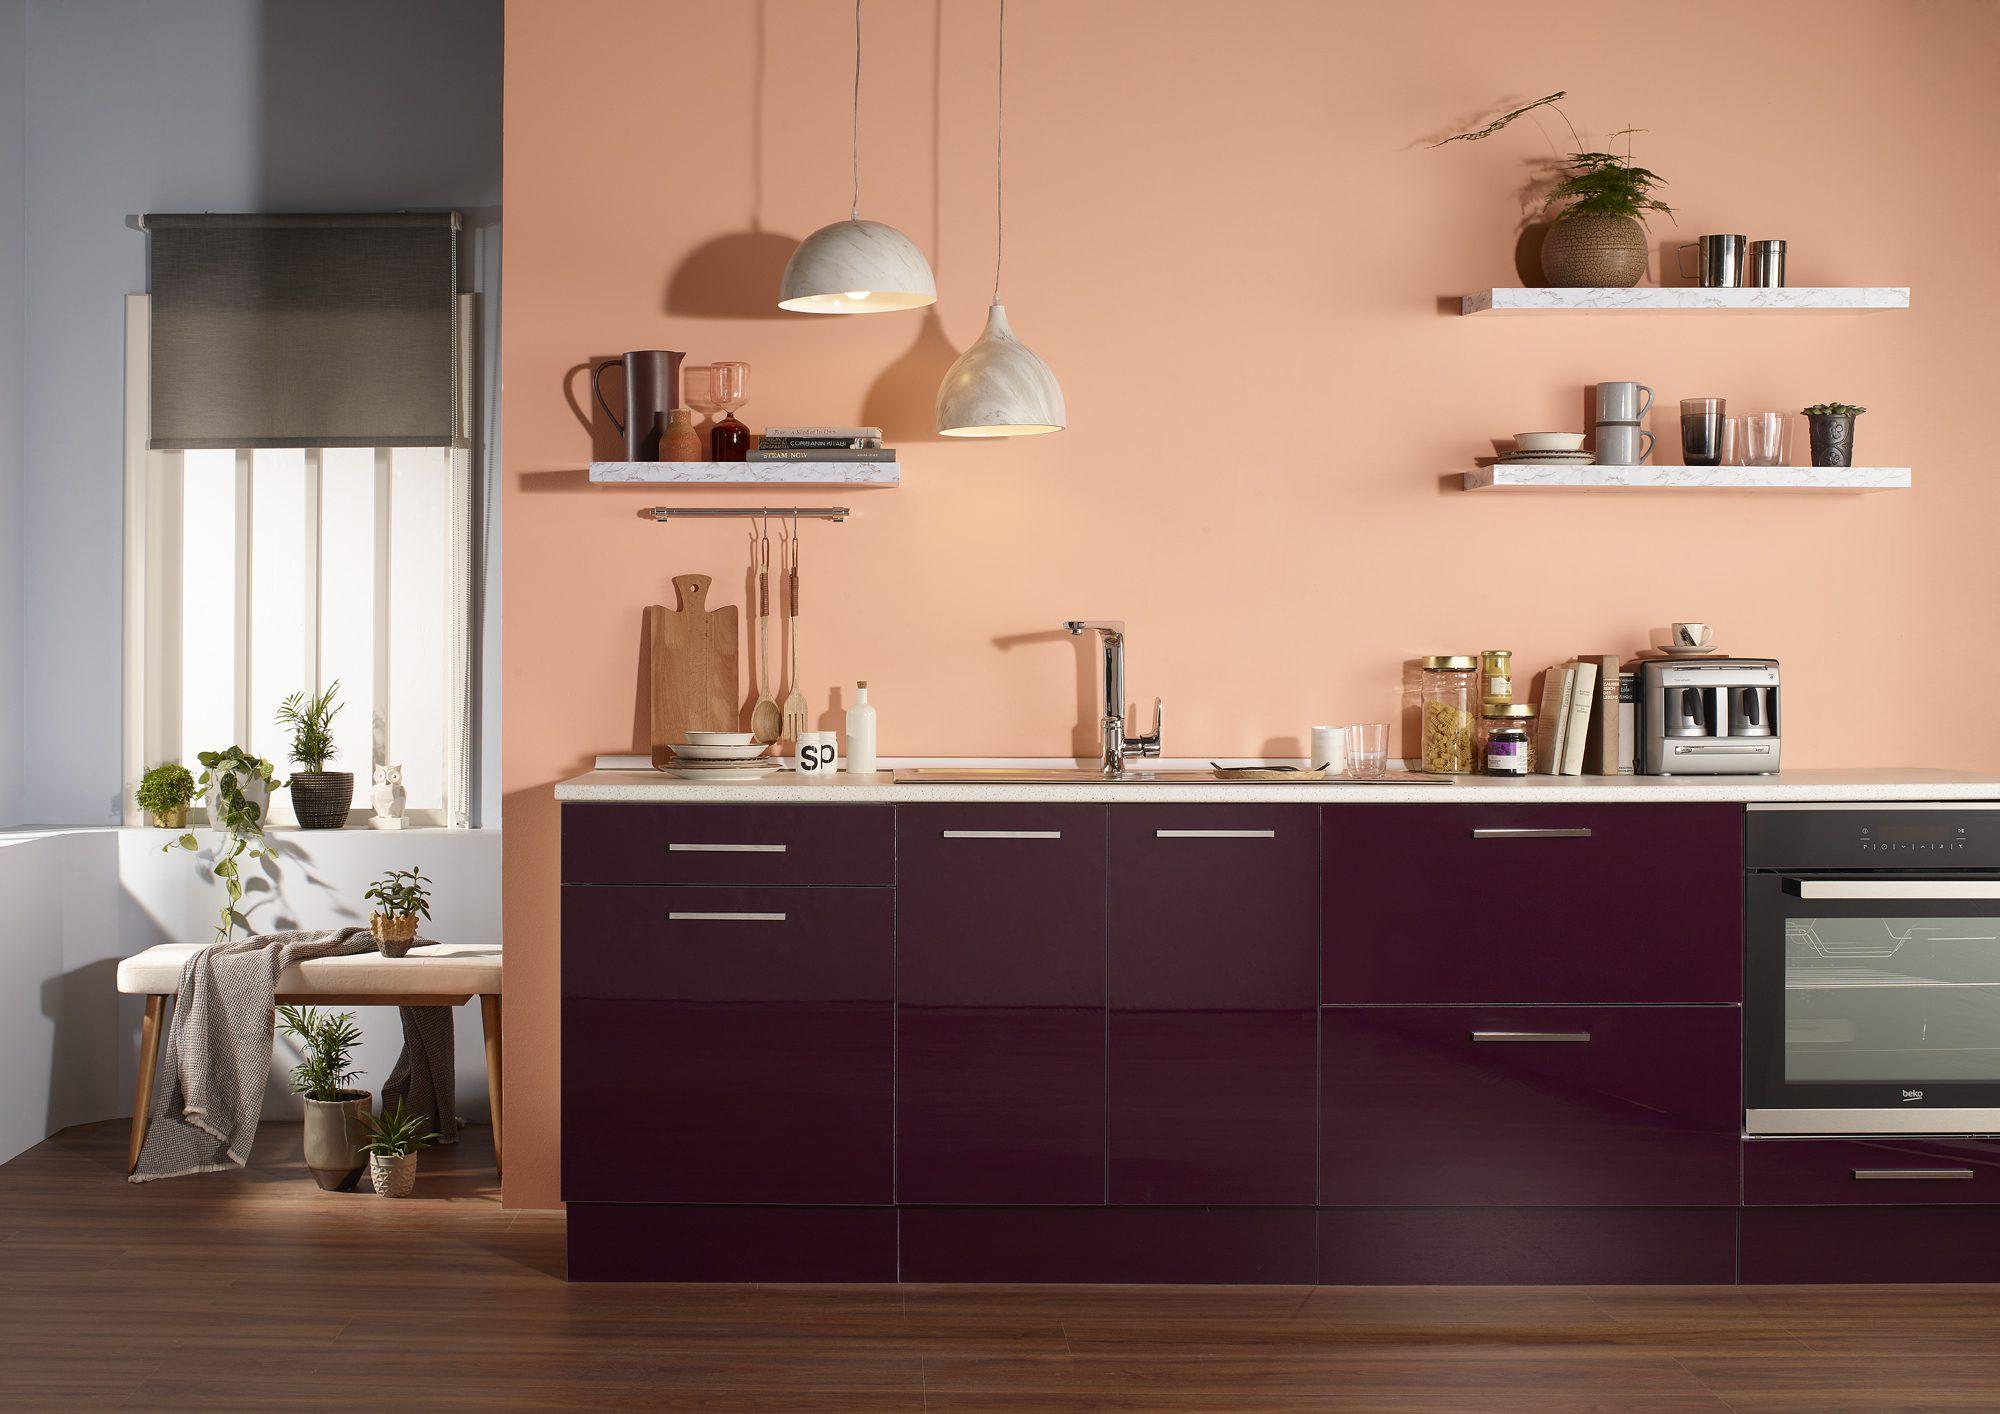 Mutfak Dekorasyonu Trendleri